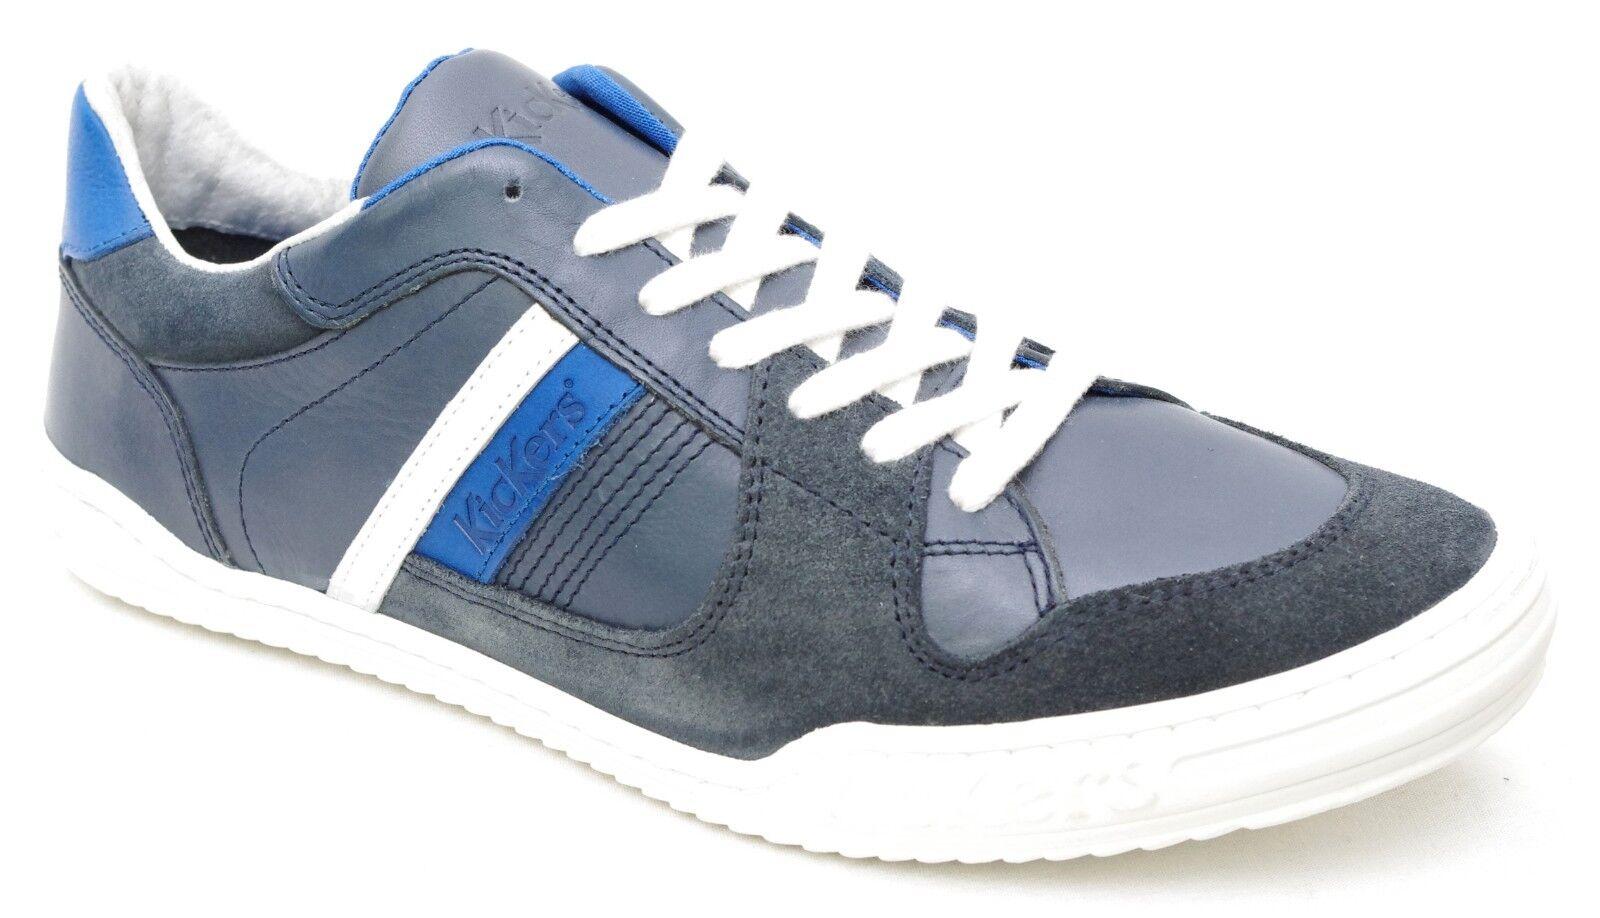 KICKERS TRIOMPHE baskets homme cuir bleu marine 412866 Taille 40